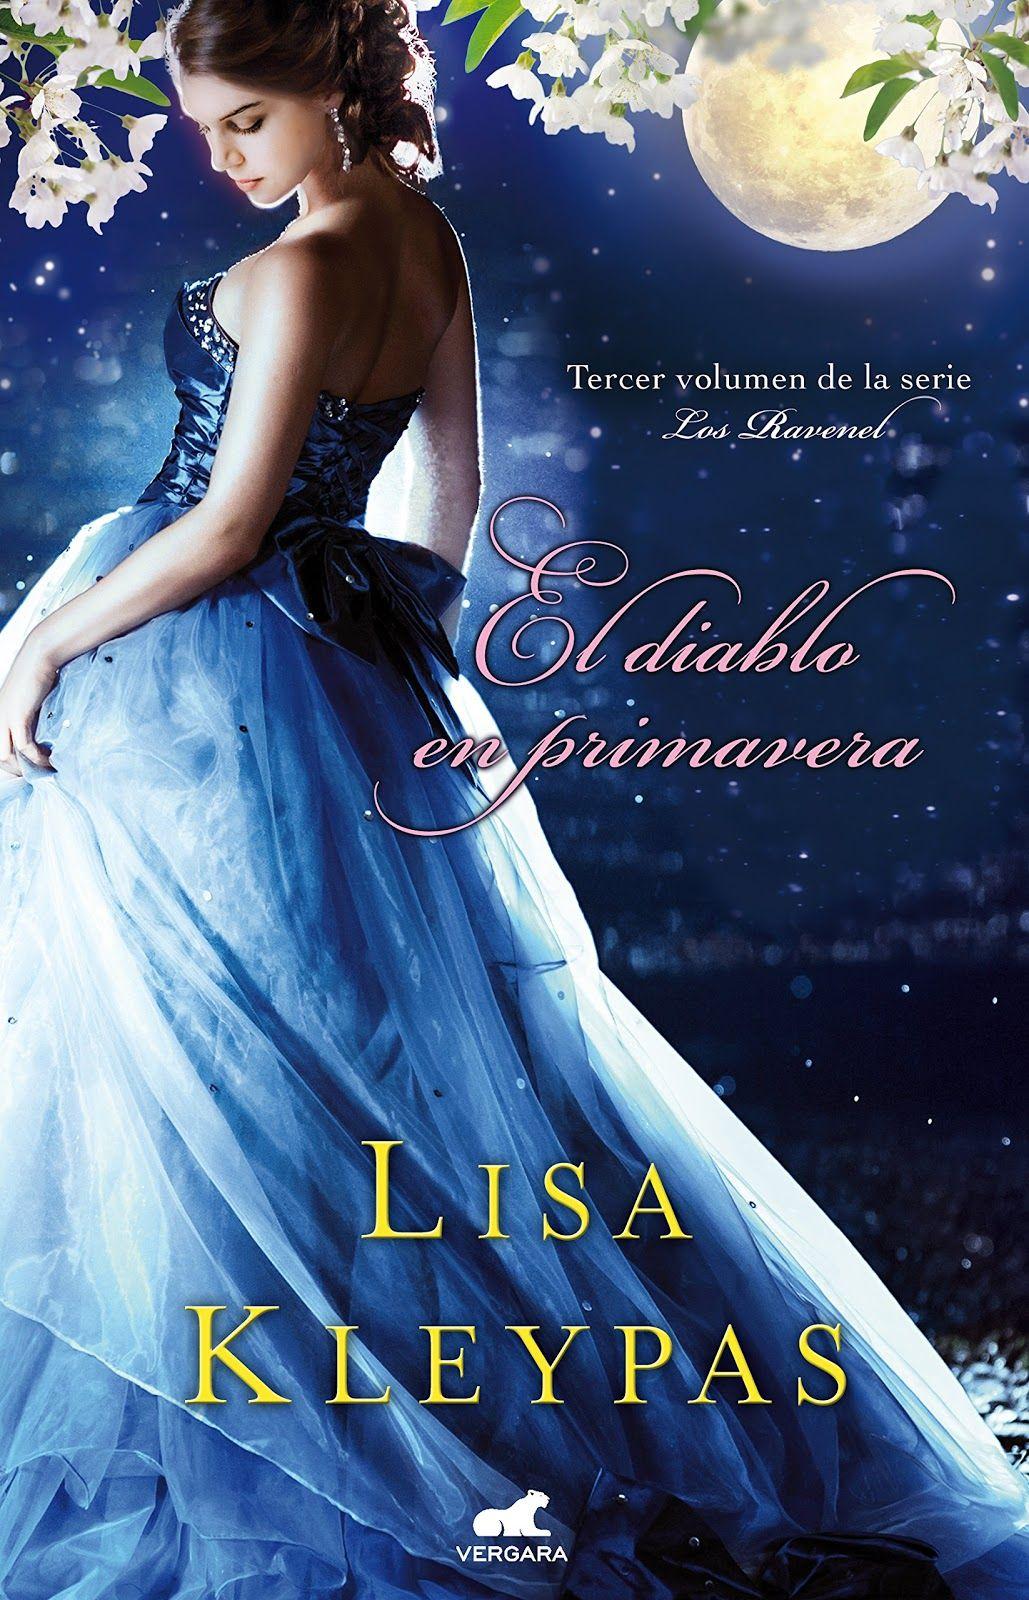 Mejor portada de novela romántica 2017 1f2c8b90e200b2cb3c192f510705d861